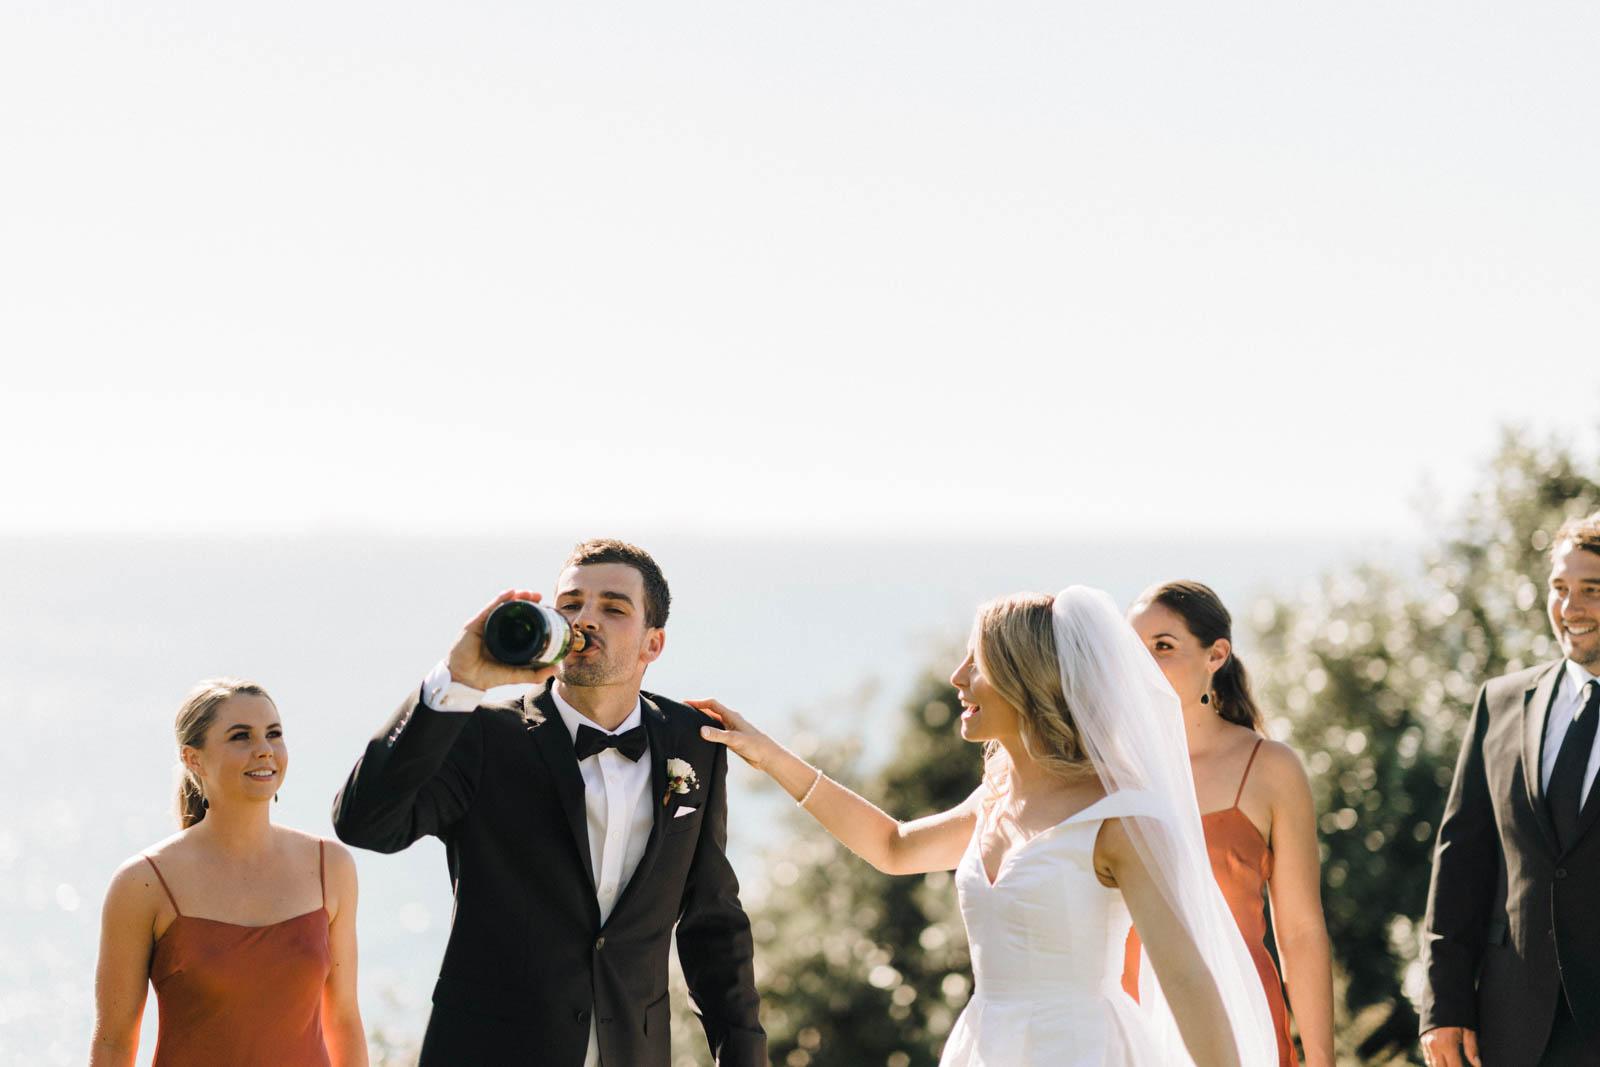 newfound-s-p-mt-maunganui-tauranga-wedding-photographer-1502-A9_05007